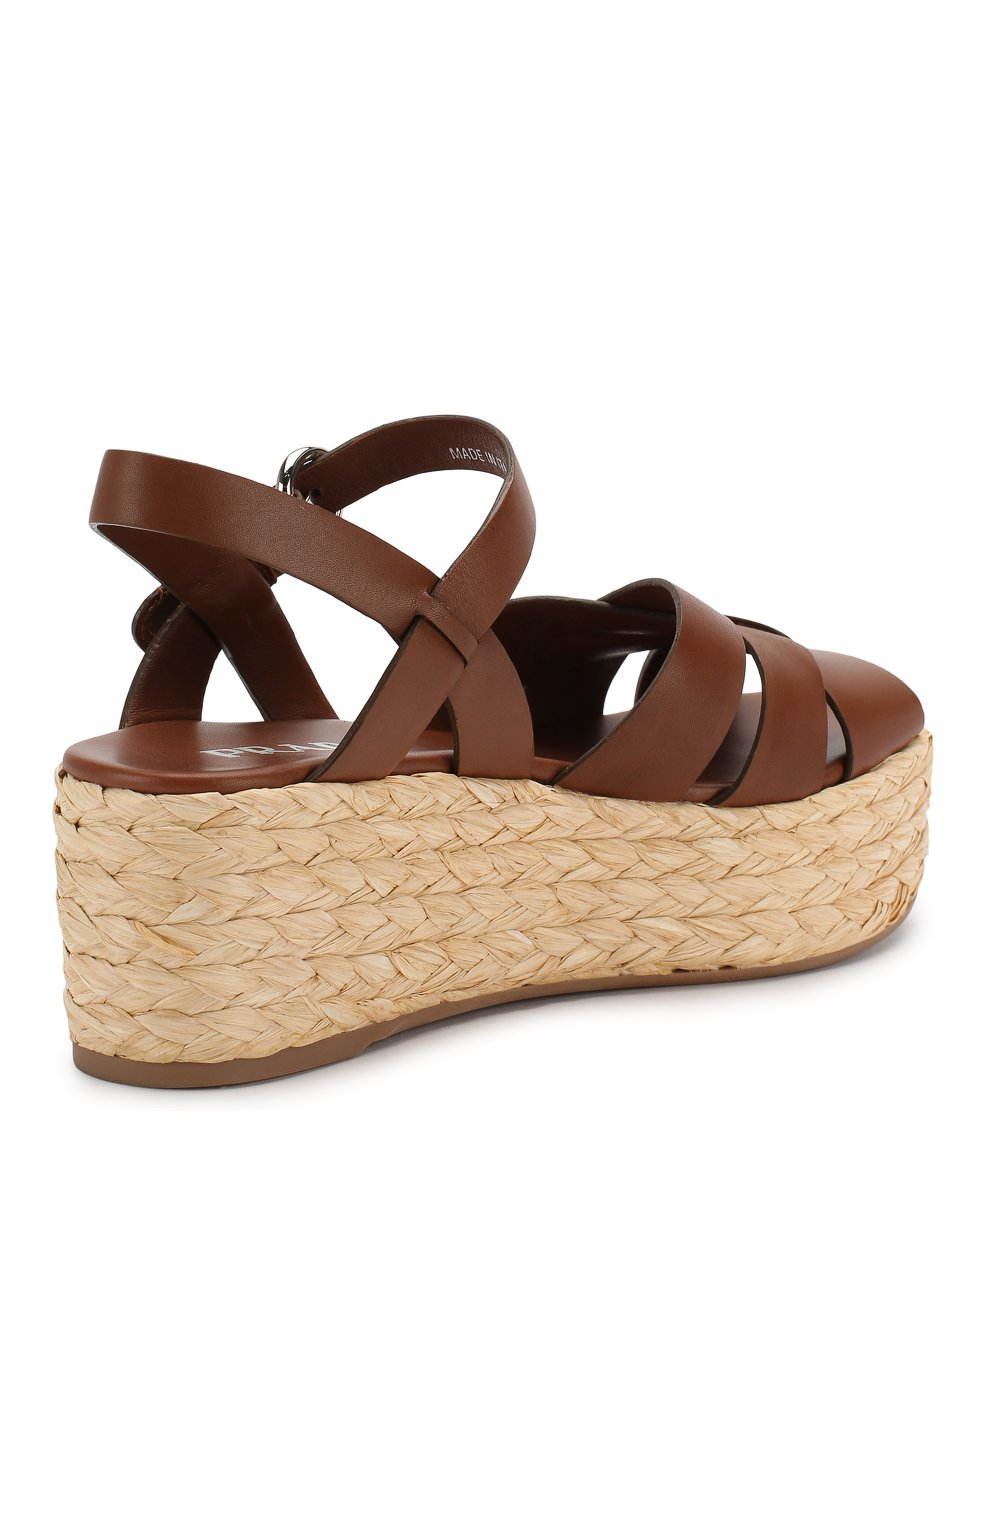 Женские сандалии   Фото №3